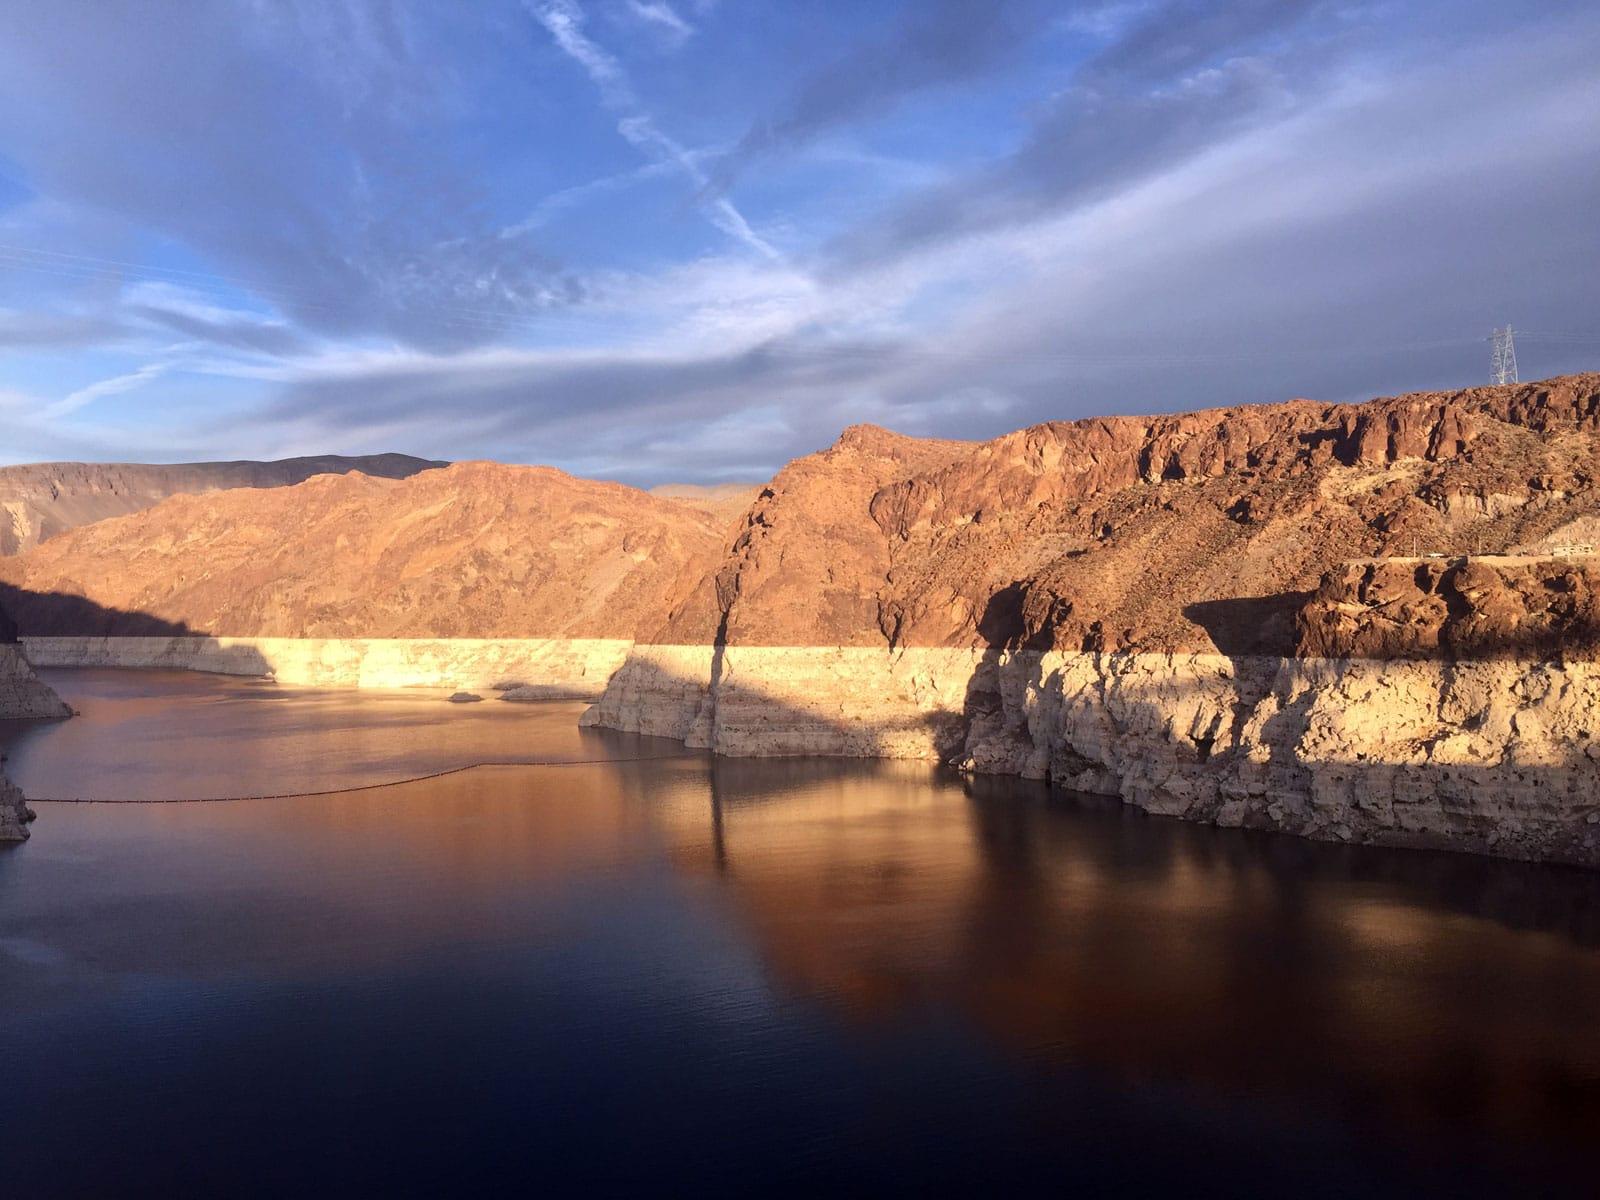 Las Vegas Trip Recap from @emilyjoanho - Hoover Dam